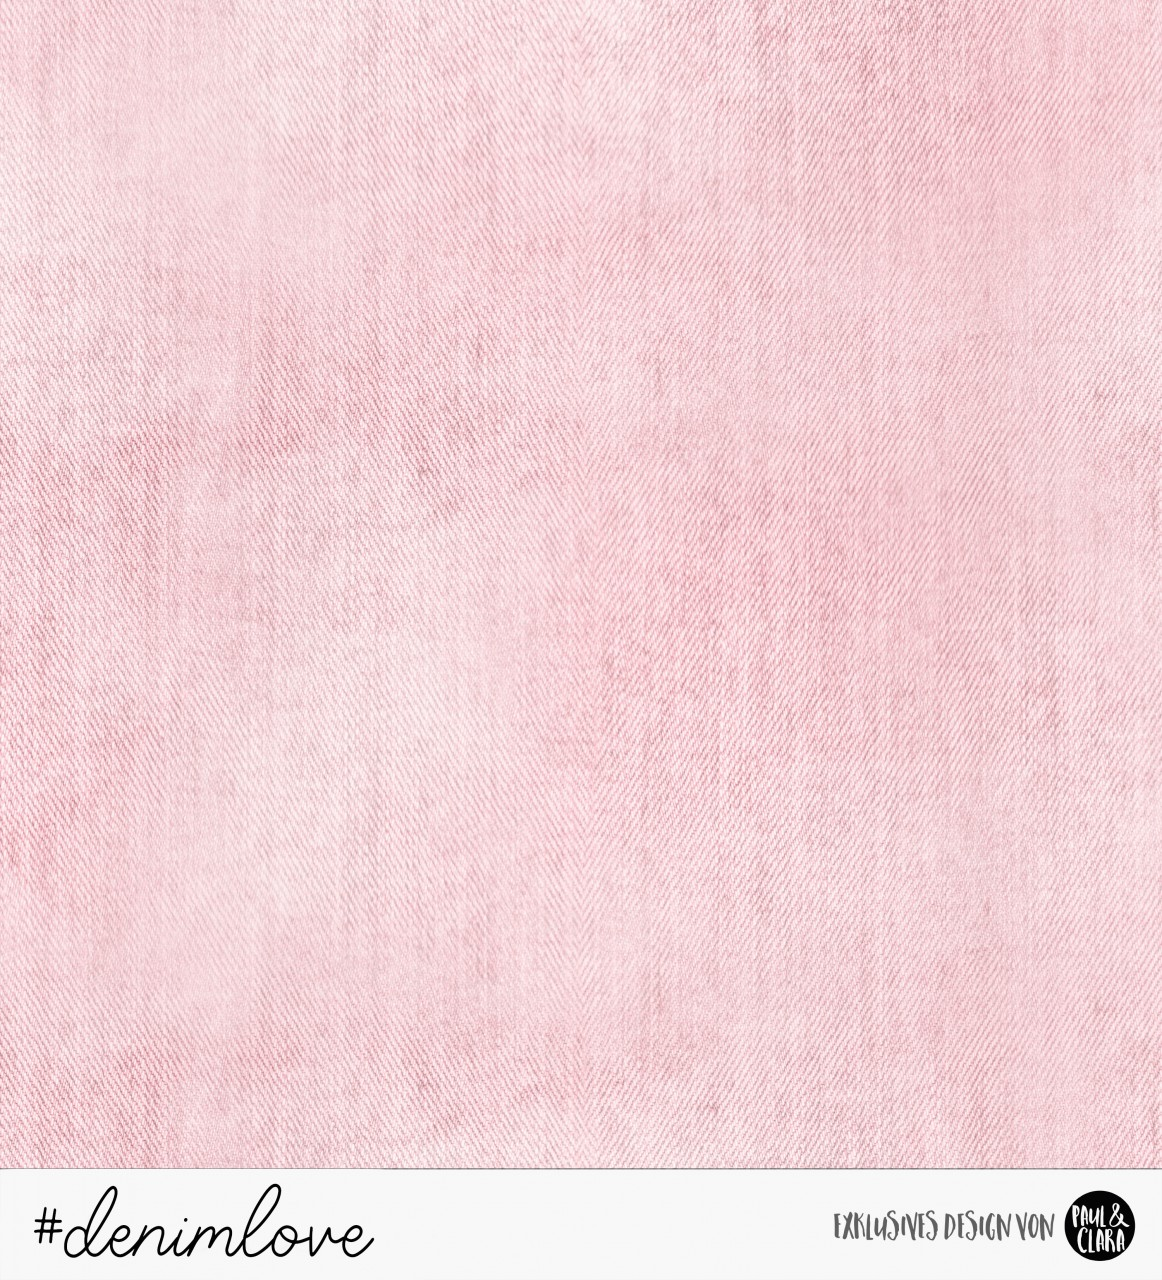 denimlove  - Rosa *Bio-Sommersweat*